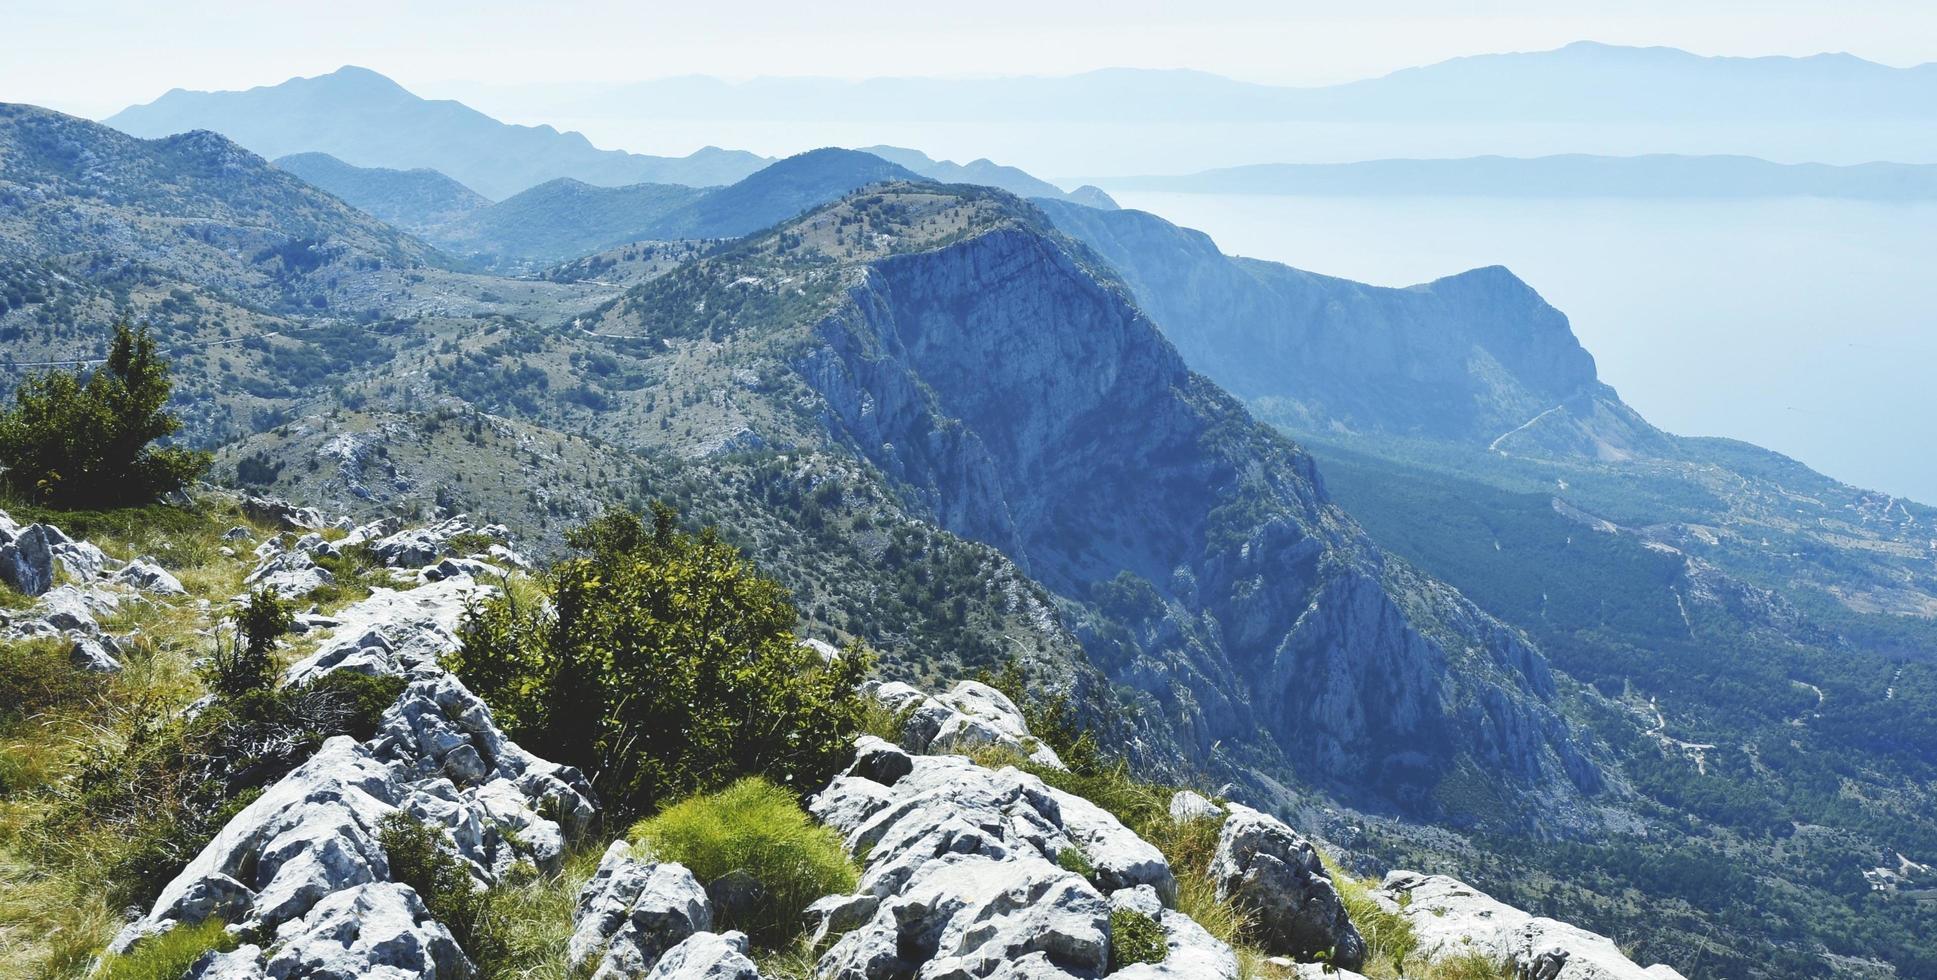 Croatia mountain landscape photo